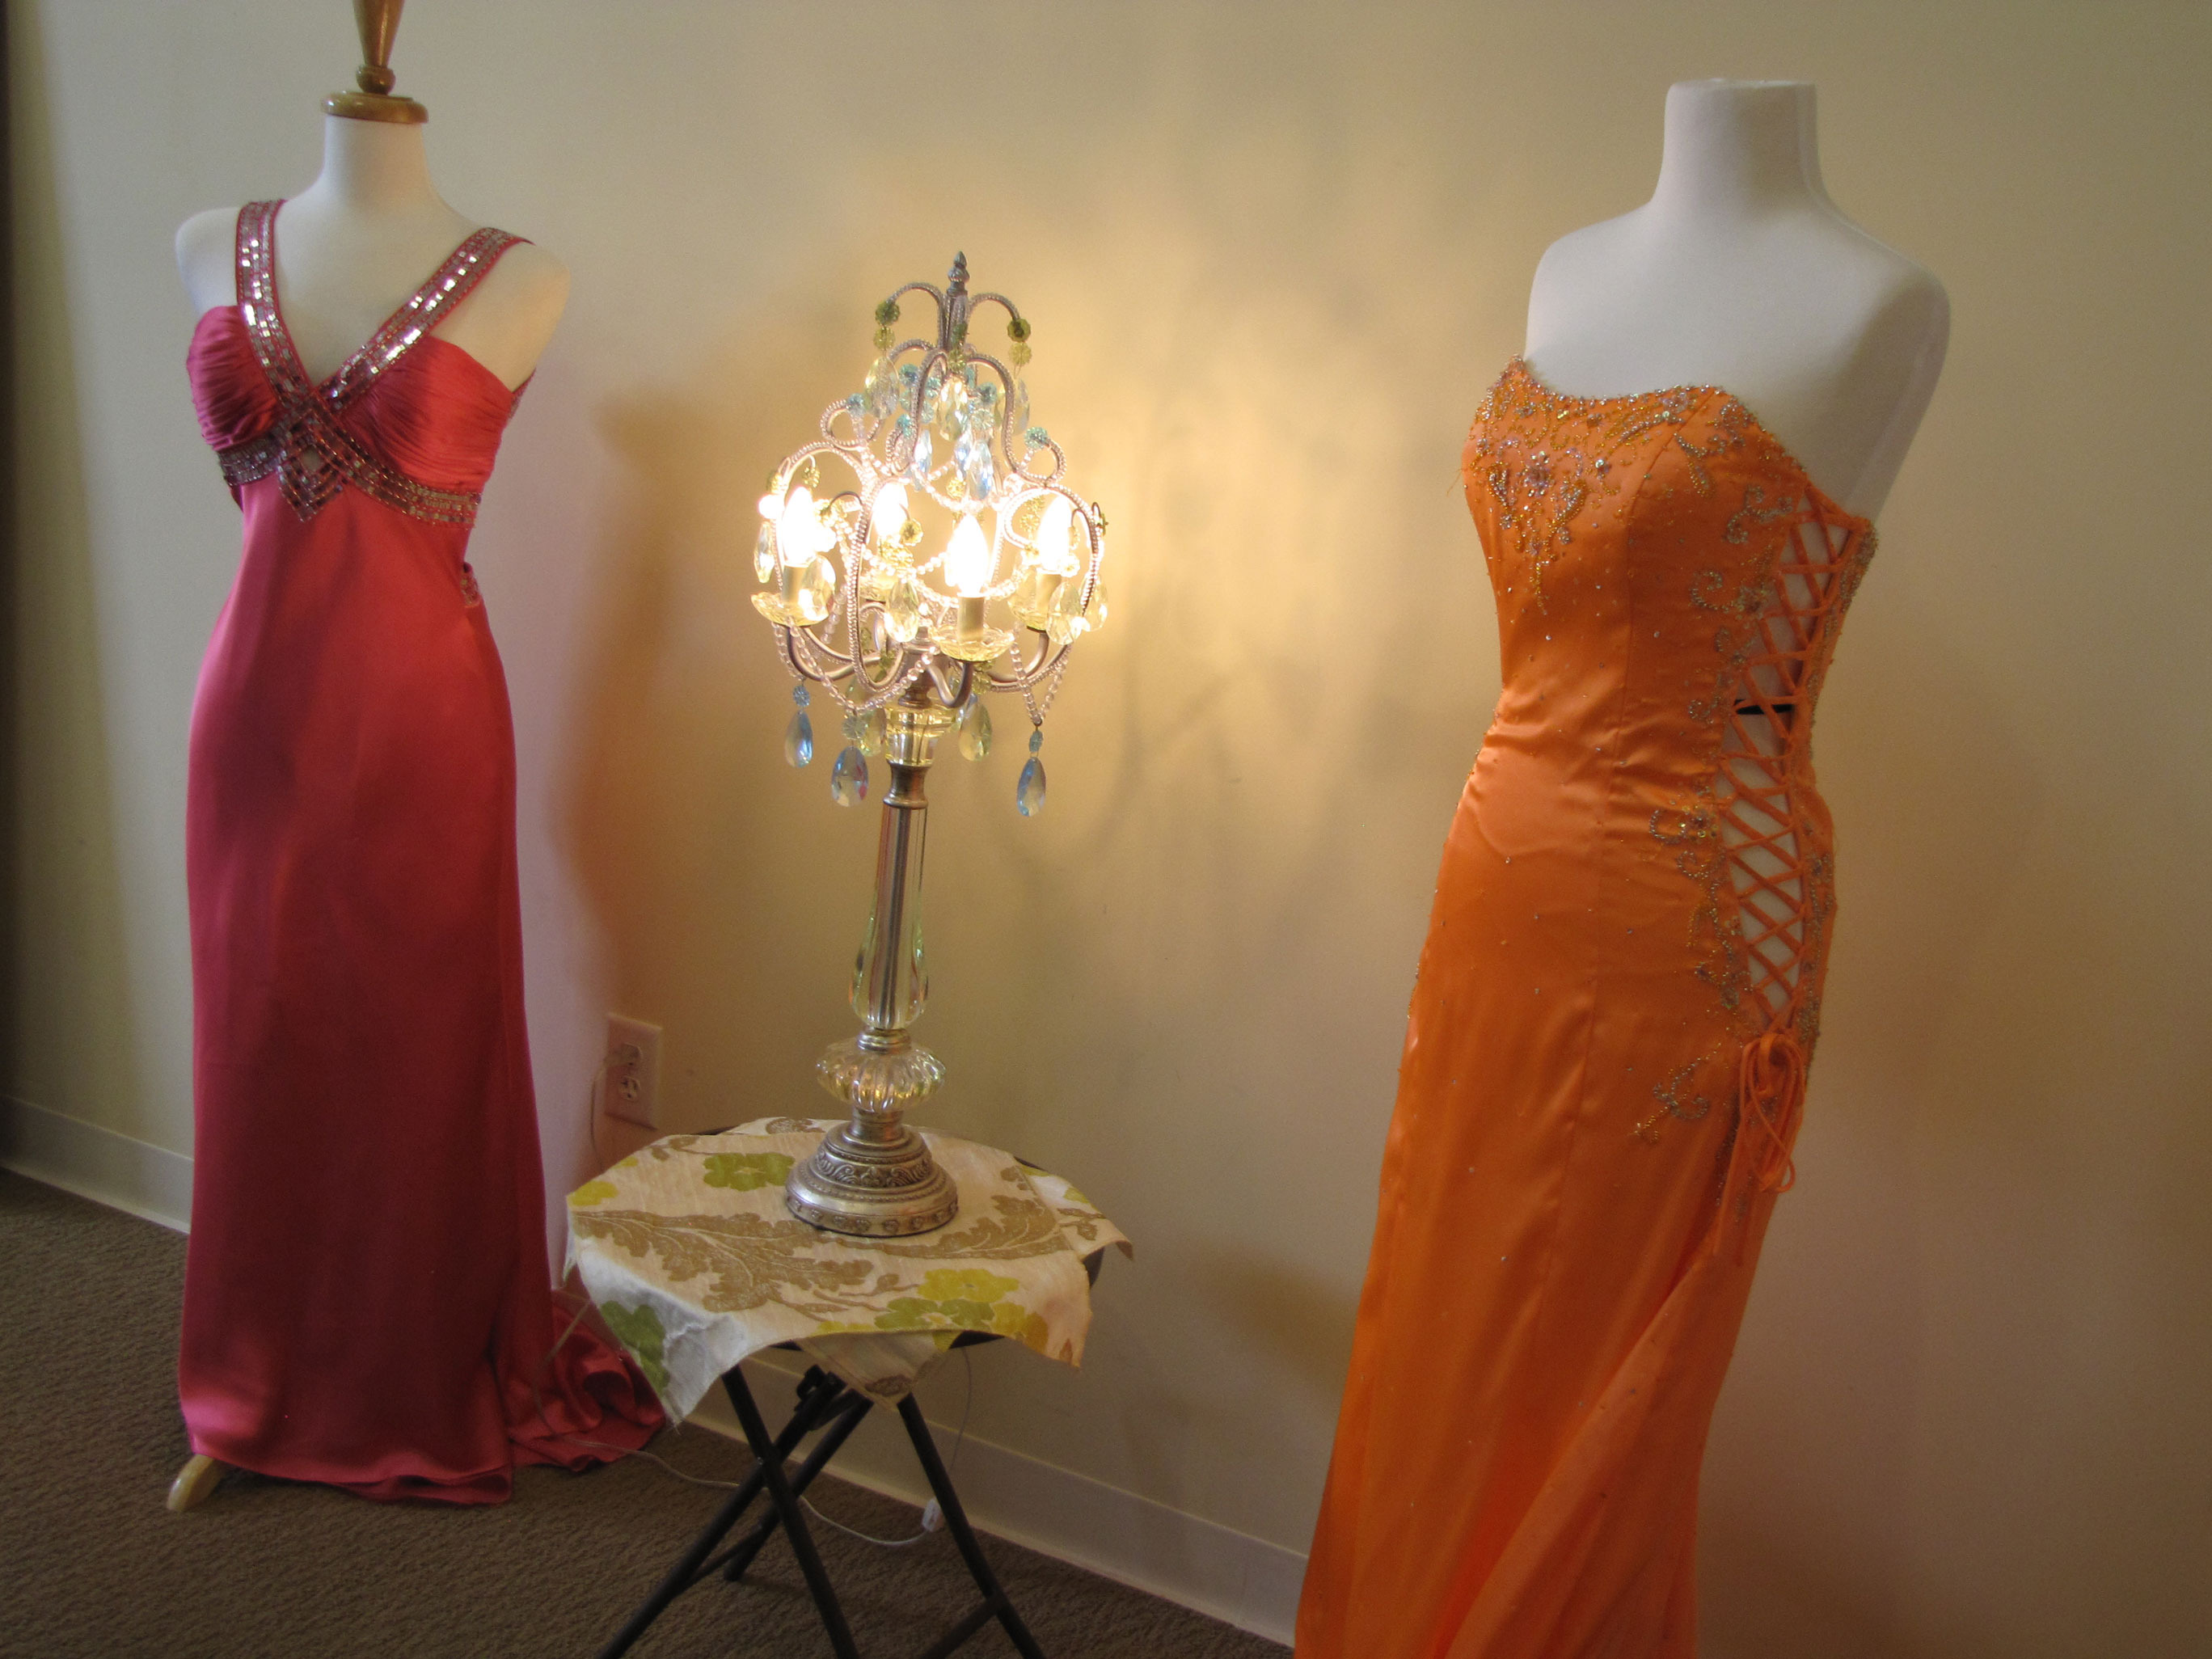 054e35f6a05f9552ff52_Prom-Shop-Dresses.jpg